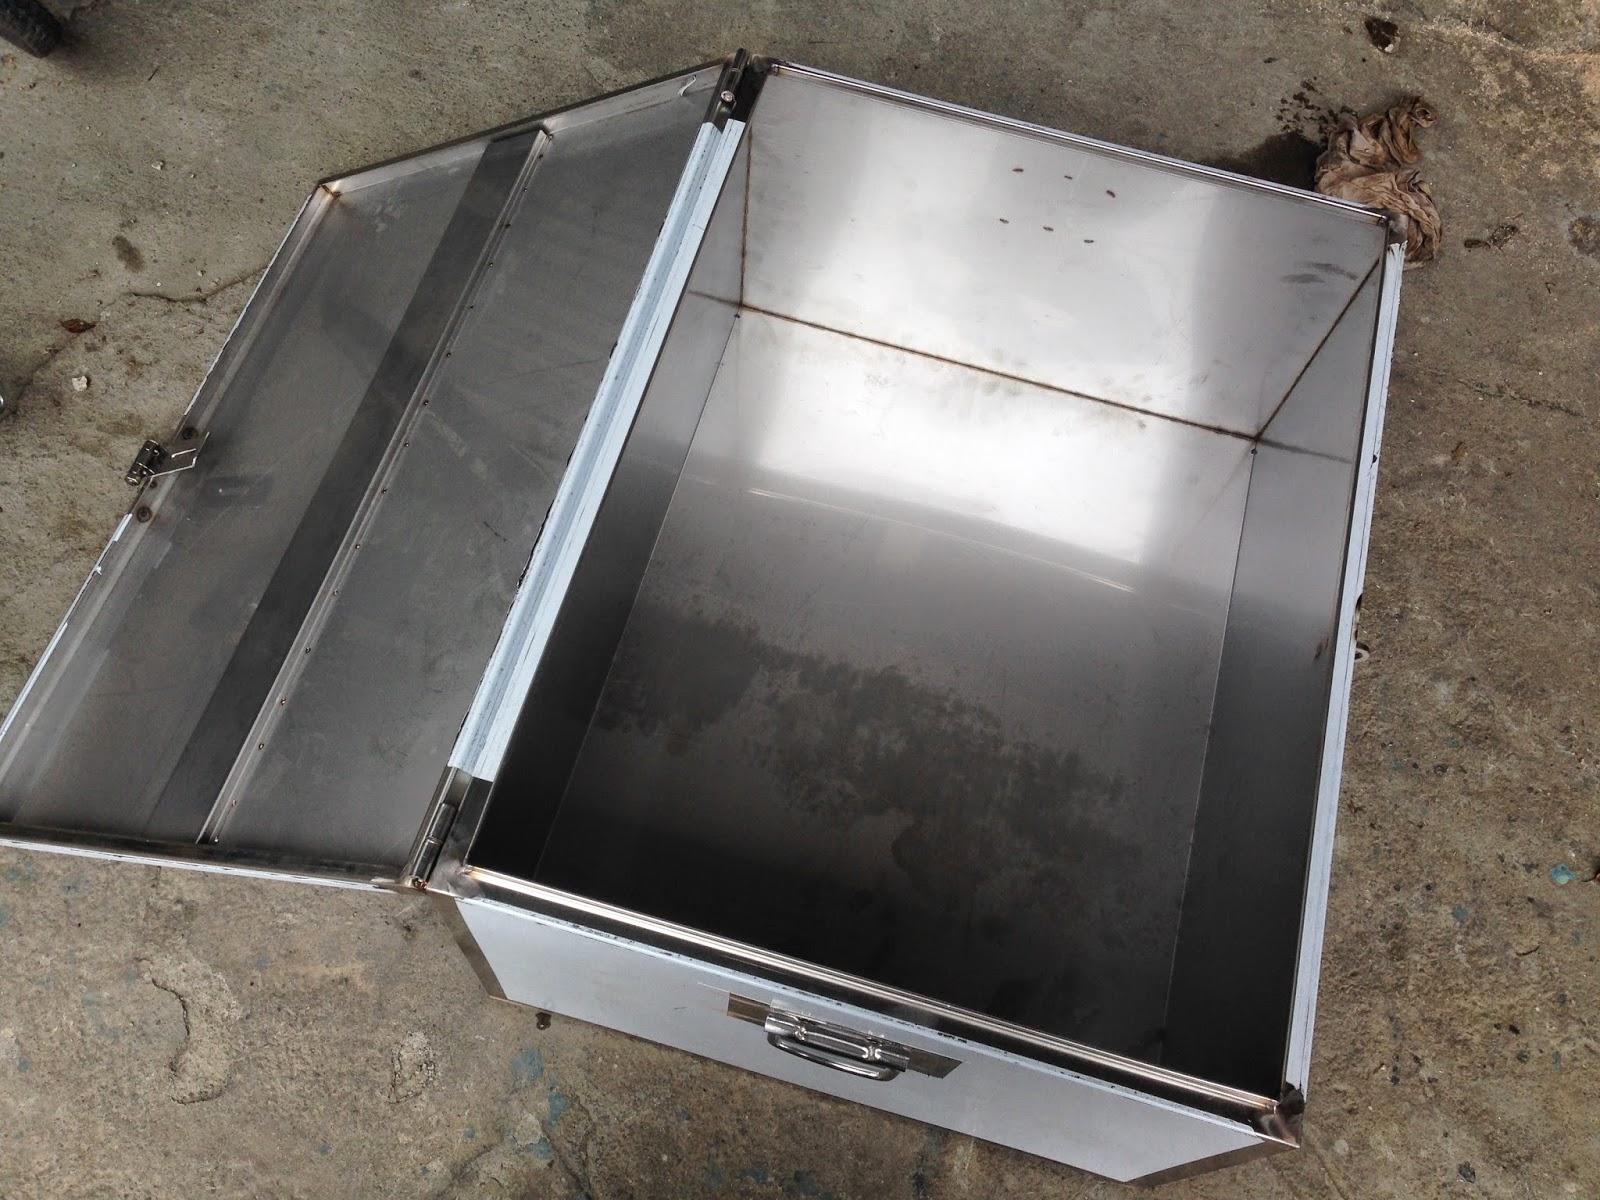 kitchen sink materials double bowl 80公分工具箱、防水箱、收納箱、方型桶、收藏箱、水箱、藏寶箱 ...